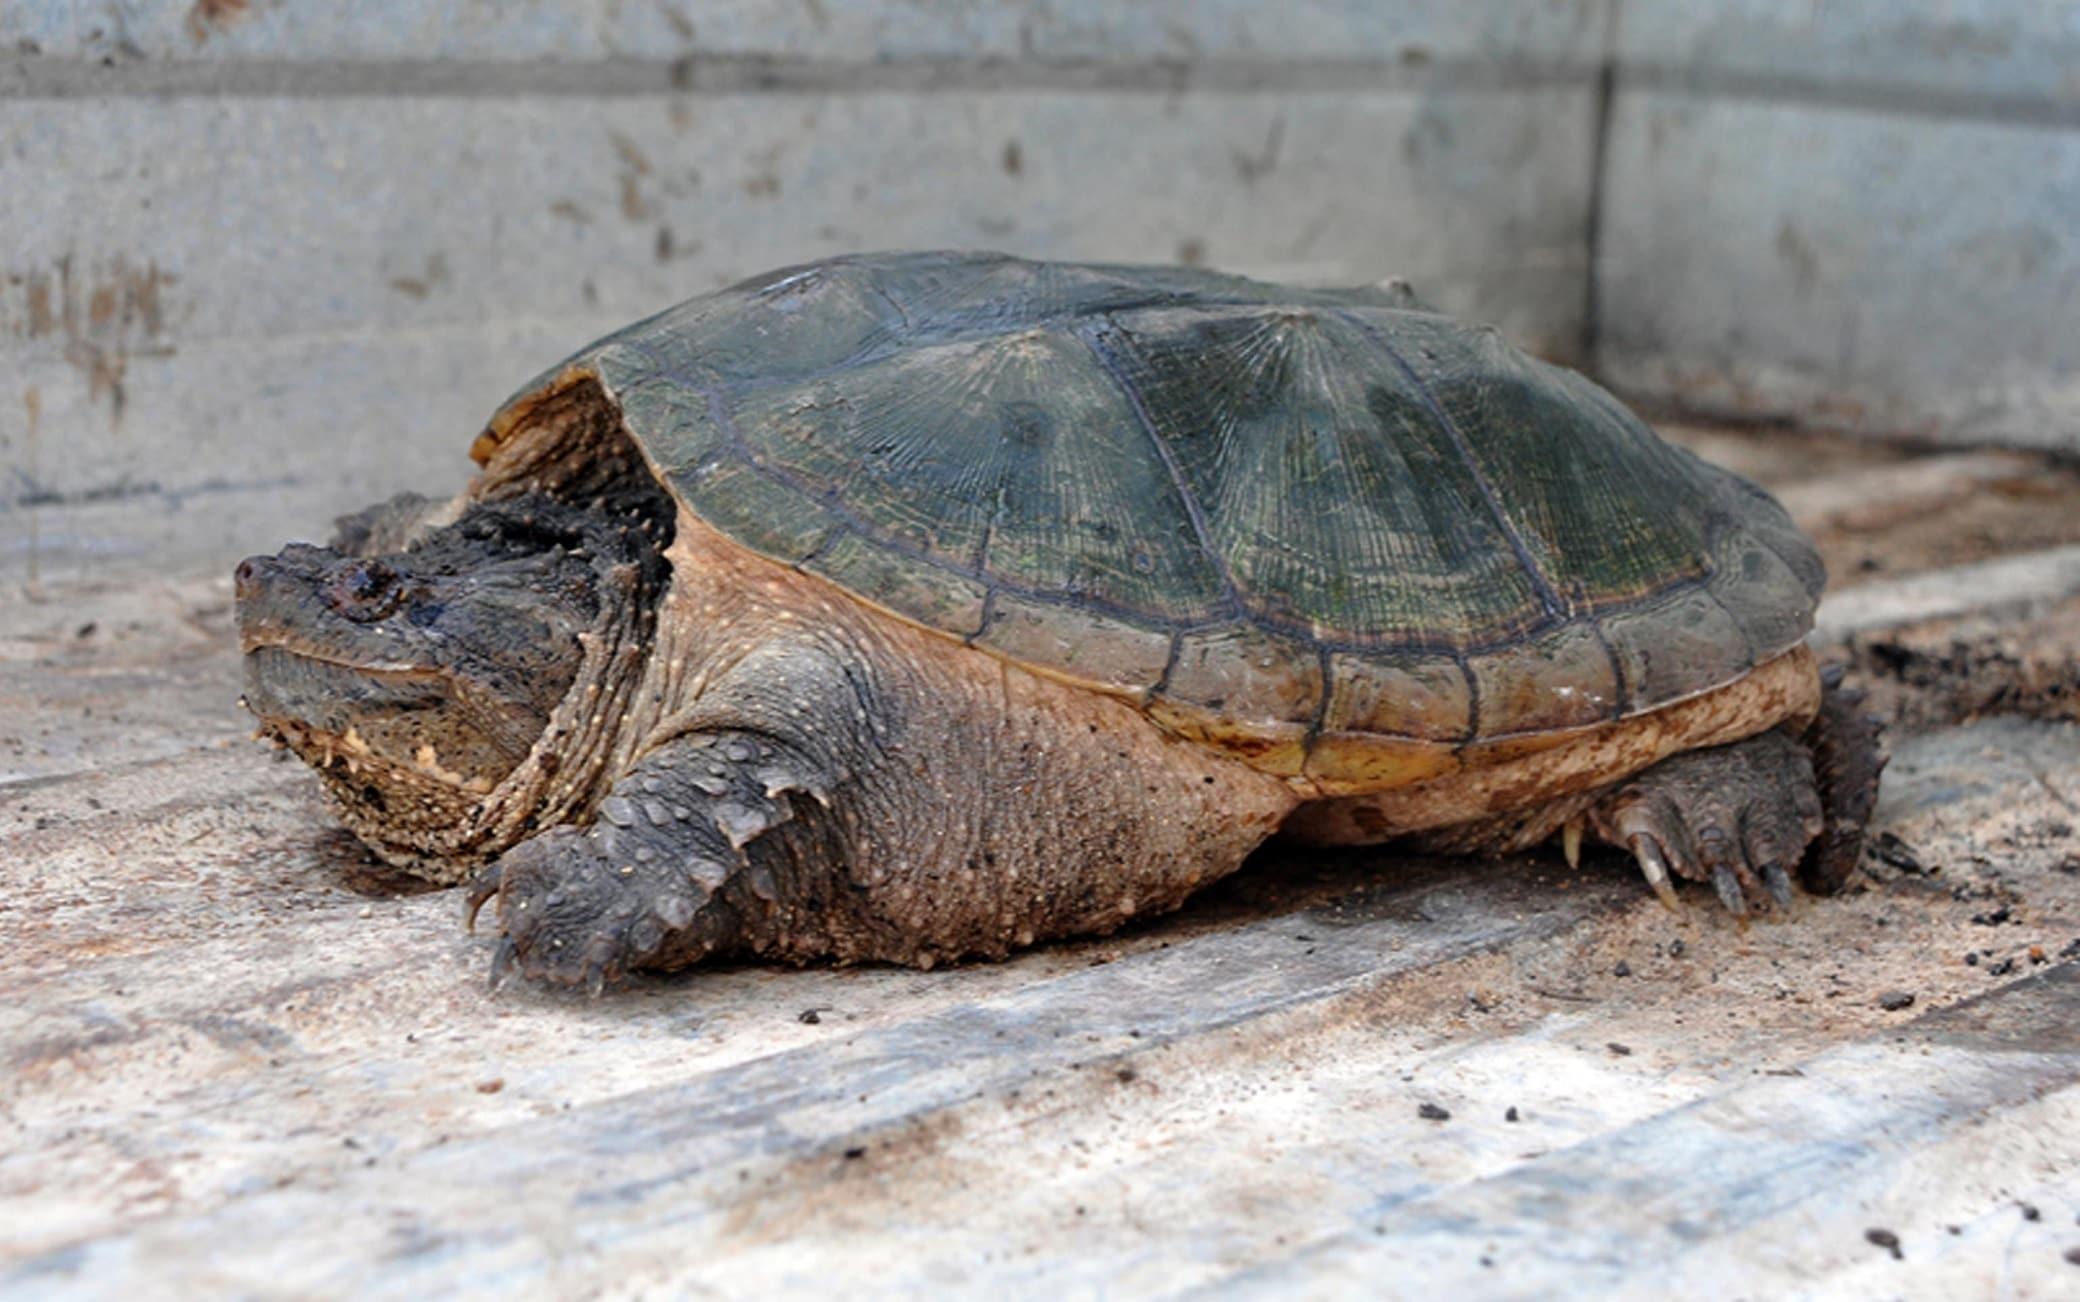 Una tartaruga azzannatrice (Chelydra serpentina)